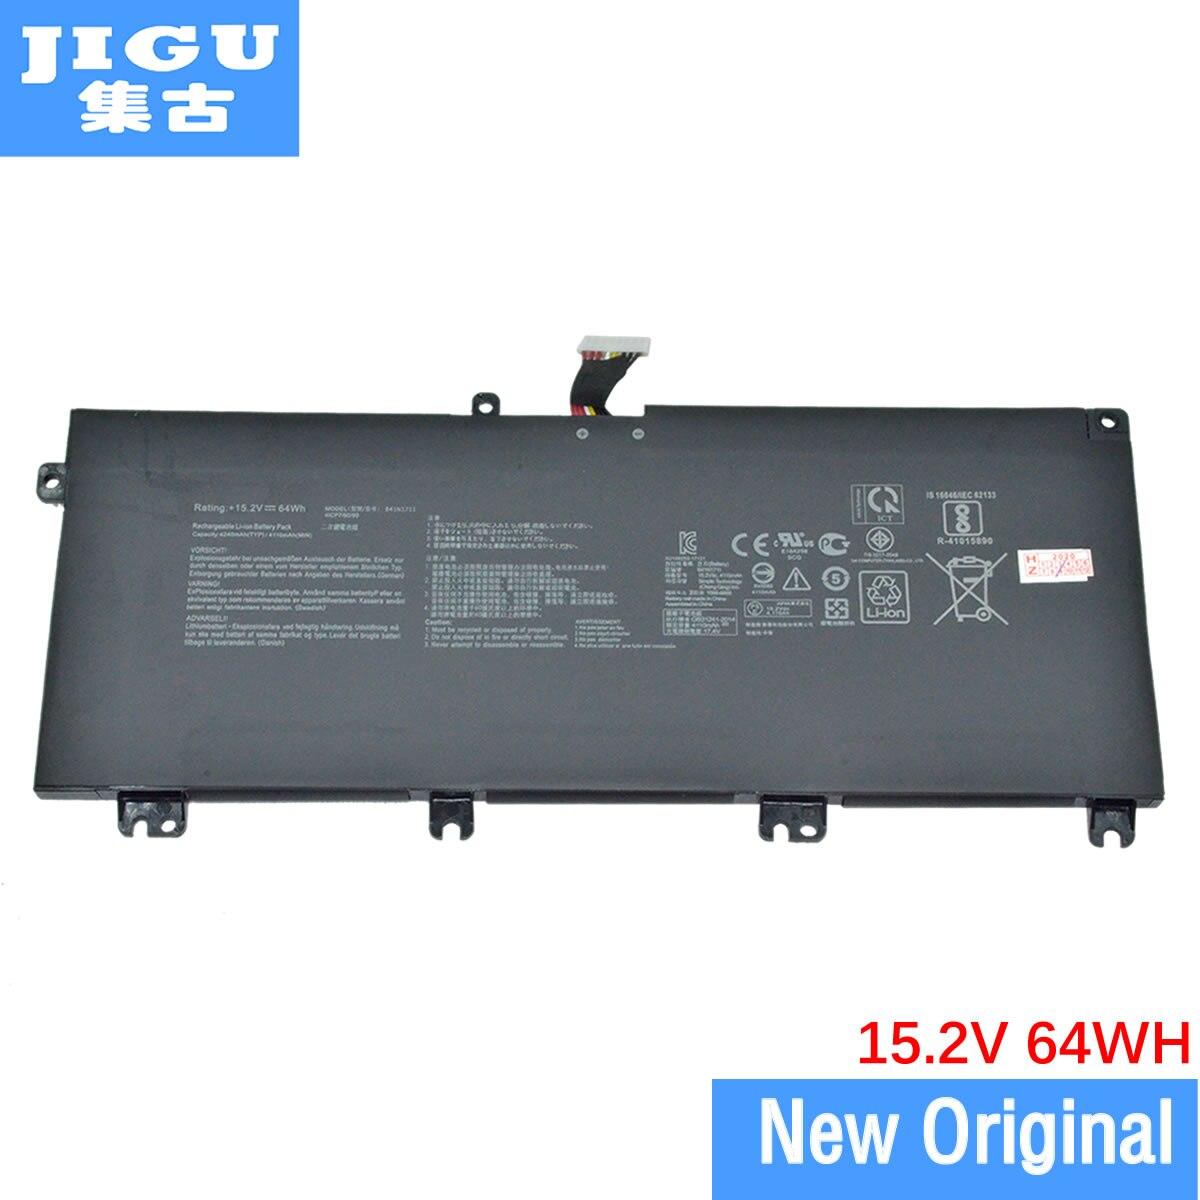 JIGU الأصلي بطارية كمبيوتر محمول B41N1711 ل ASUS ZX63 ZX63VD ZX73VM GL703 FX705D FX705 GL503GE GL703VM GL703VD GL703GE GL503VM